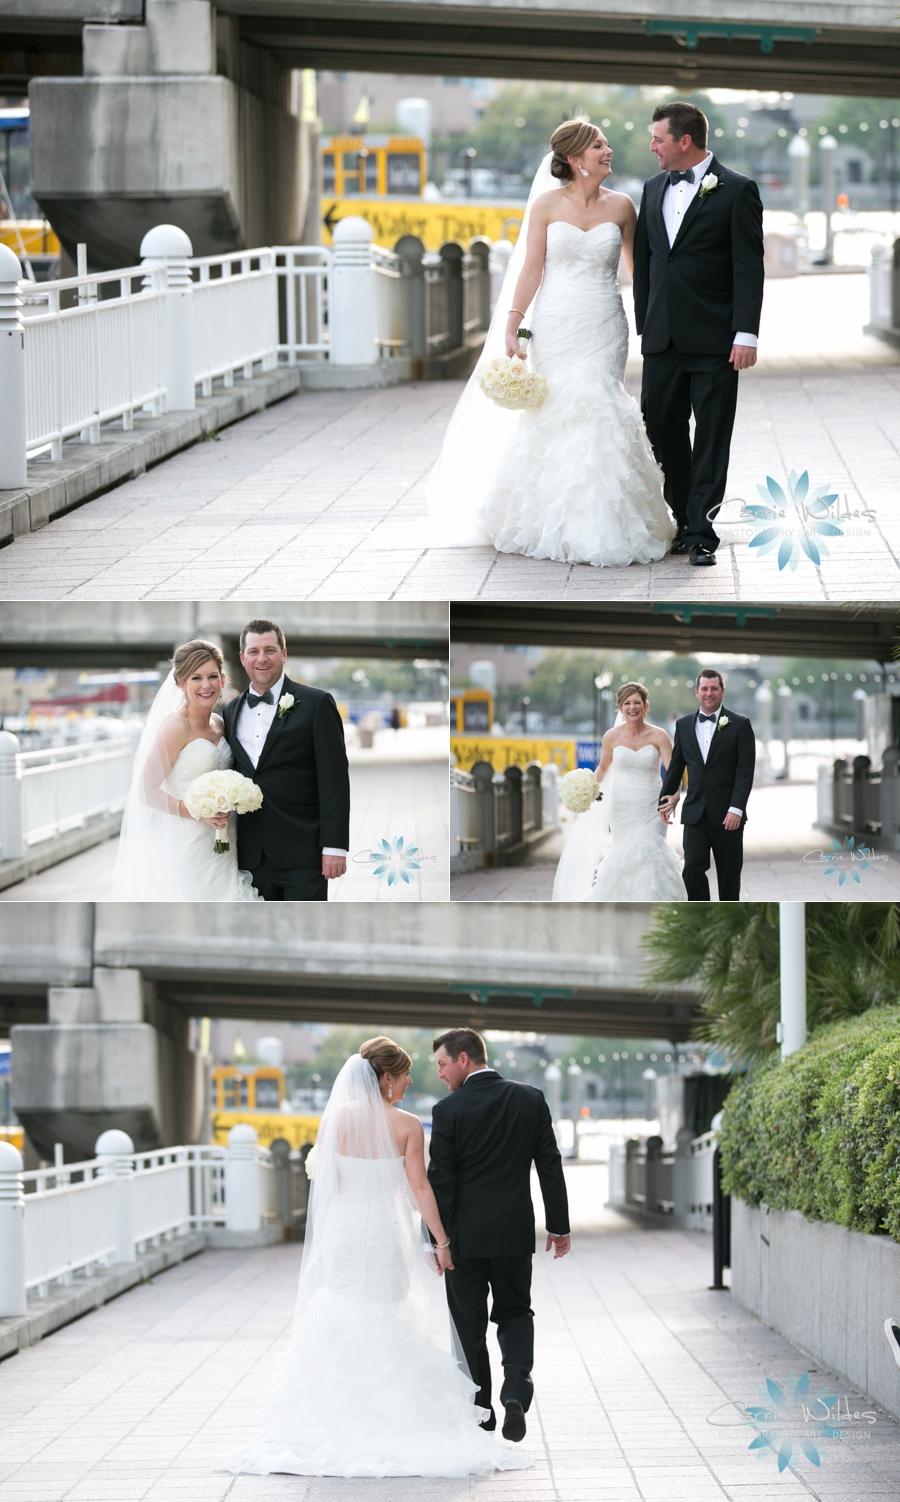 3_26_16 Marriott Waterside Wedding 28.jpg